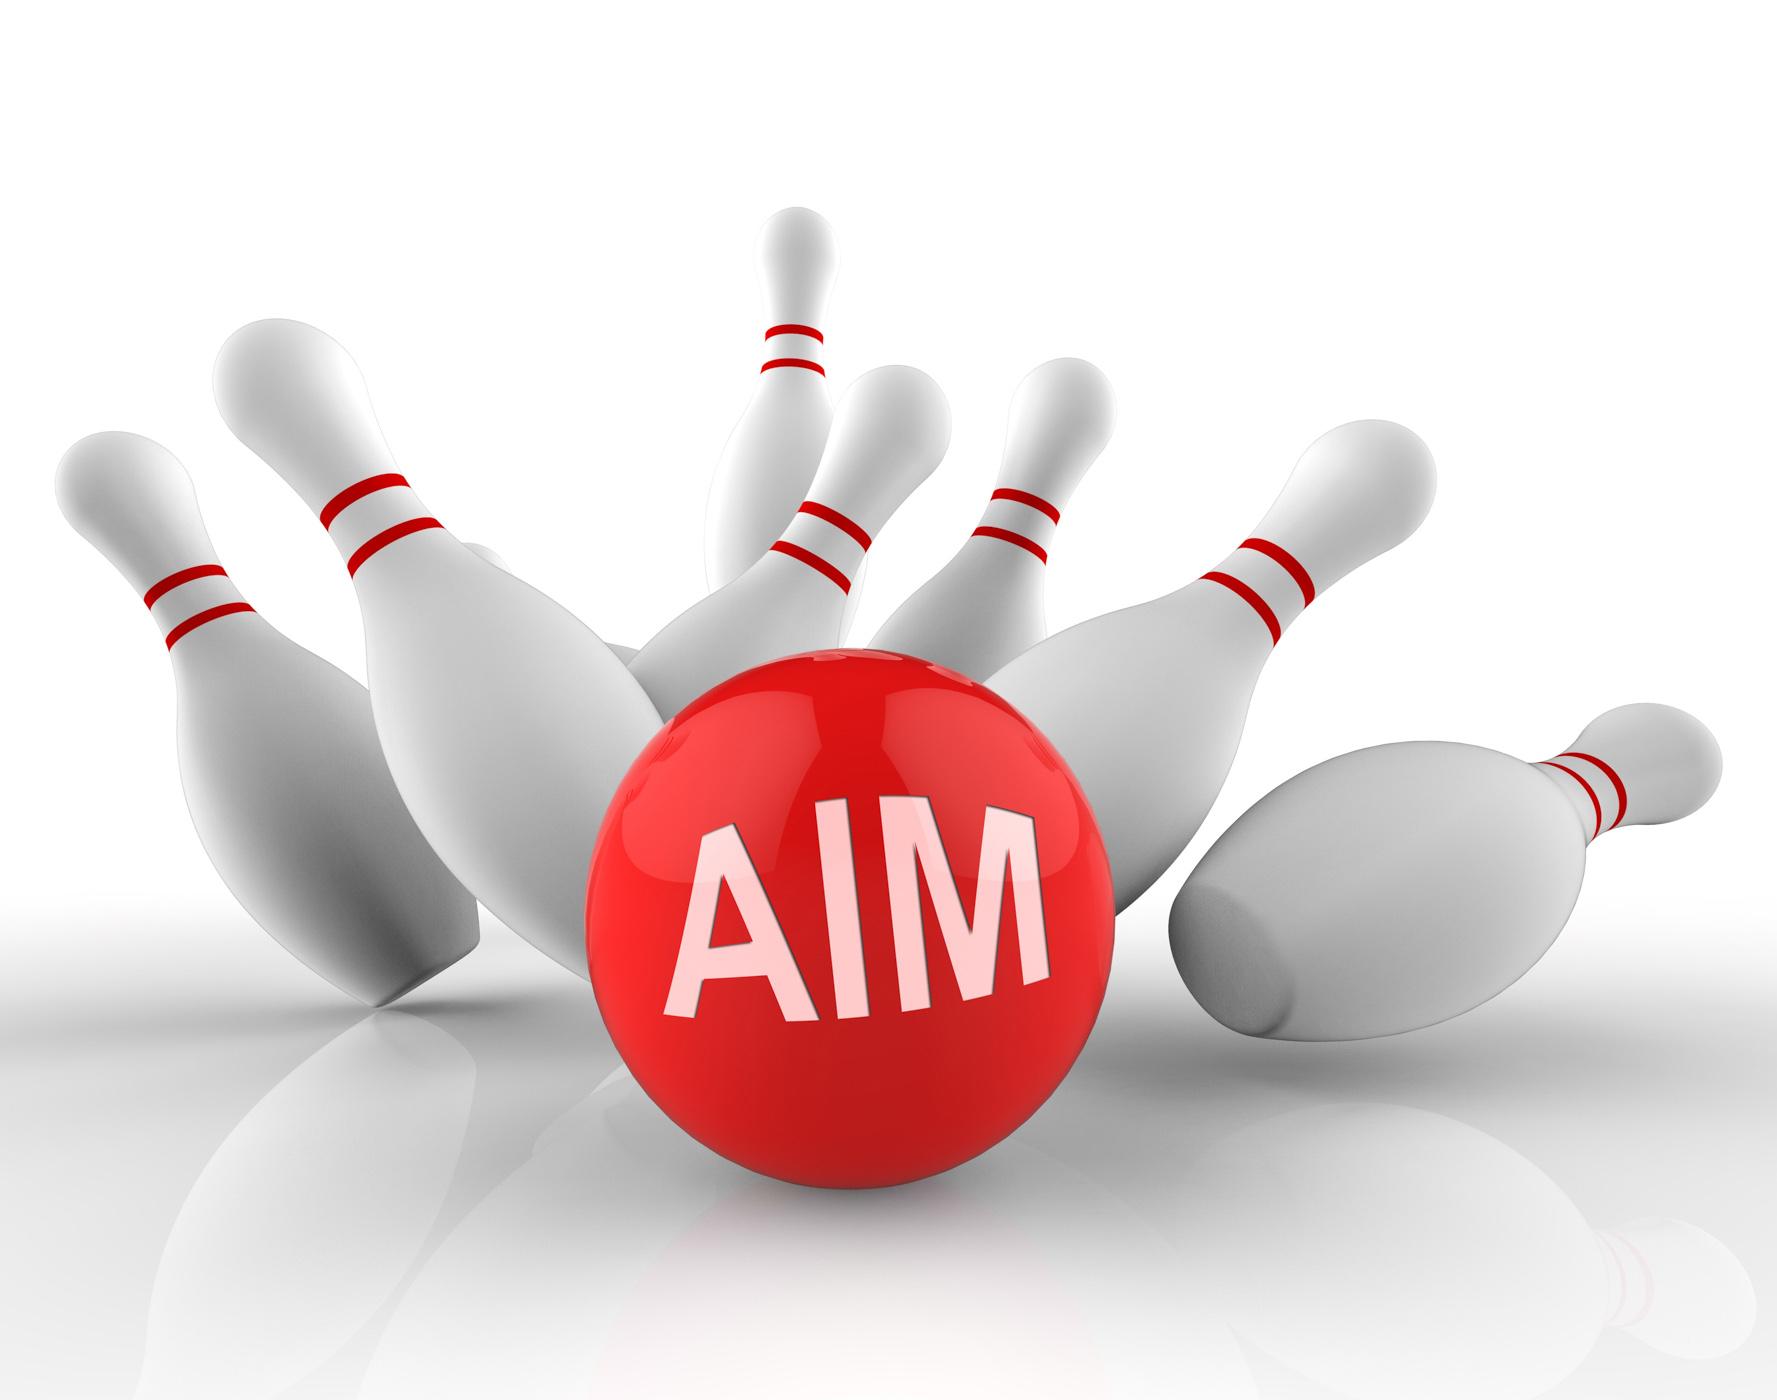 Bowling aim represents aims strike 3d rendering photo